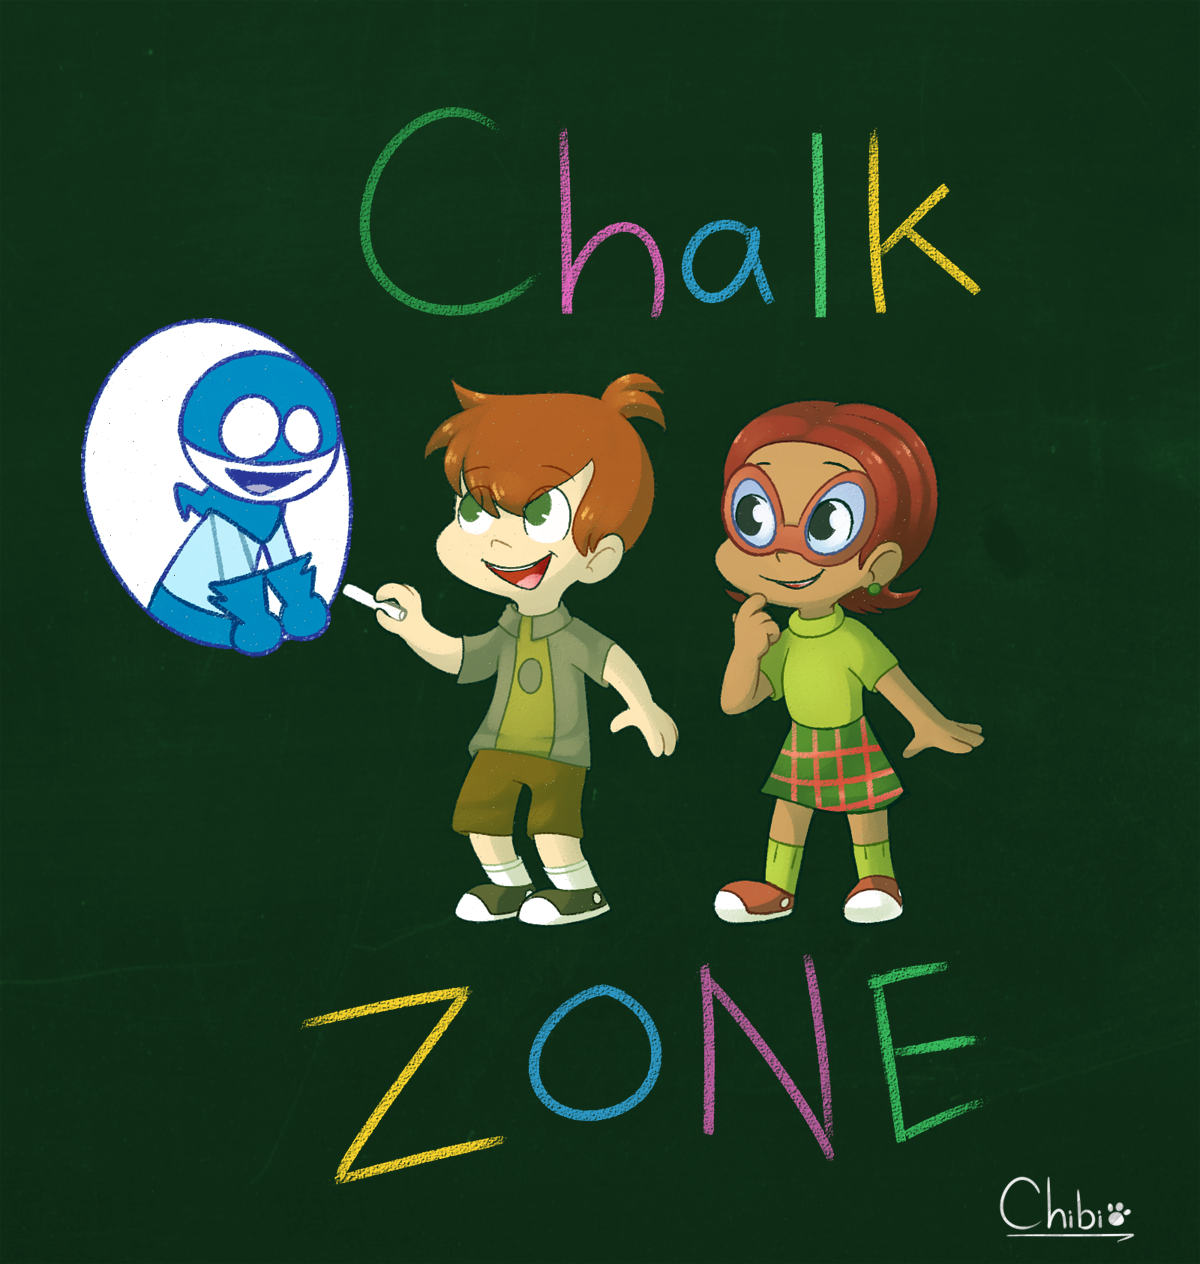 Kumpulan Gambar Chalkzone Gambar Lucu Terbaru Cartoon